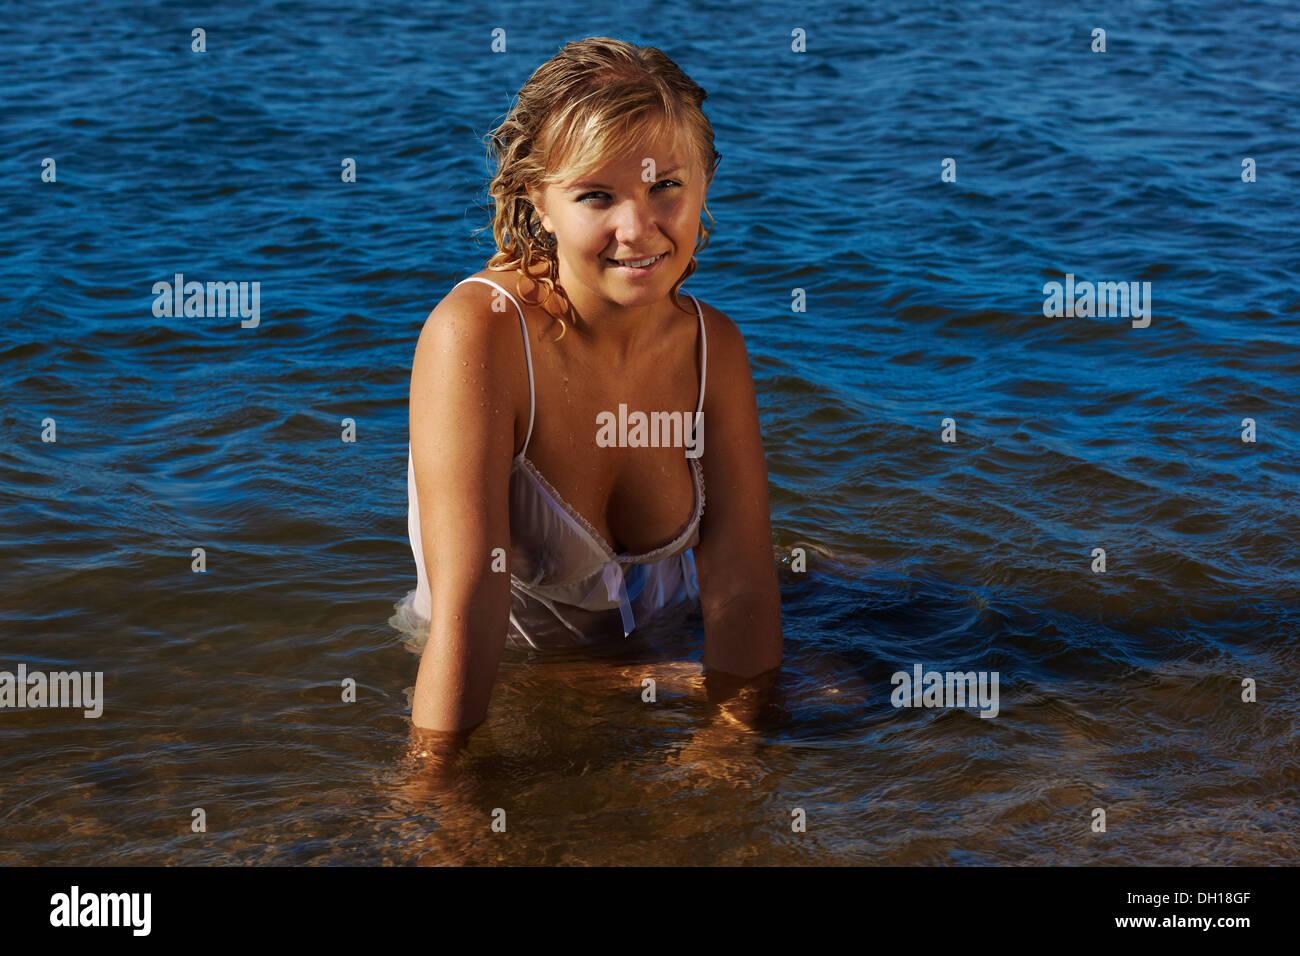 undies water woman stock photos & undies water woman stock images